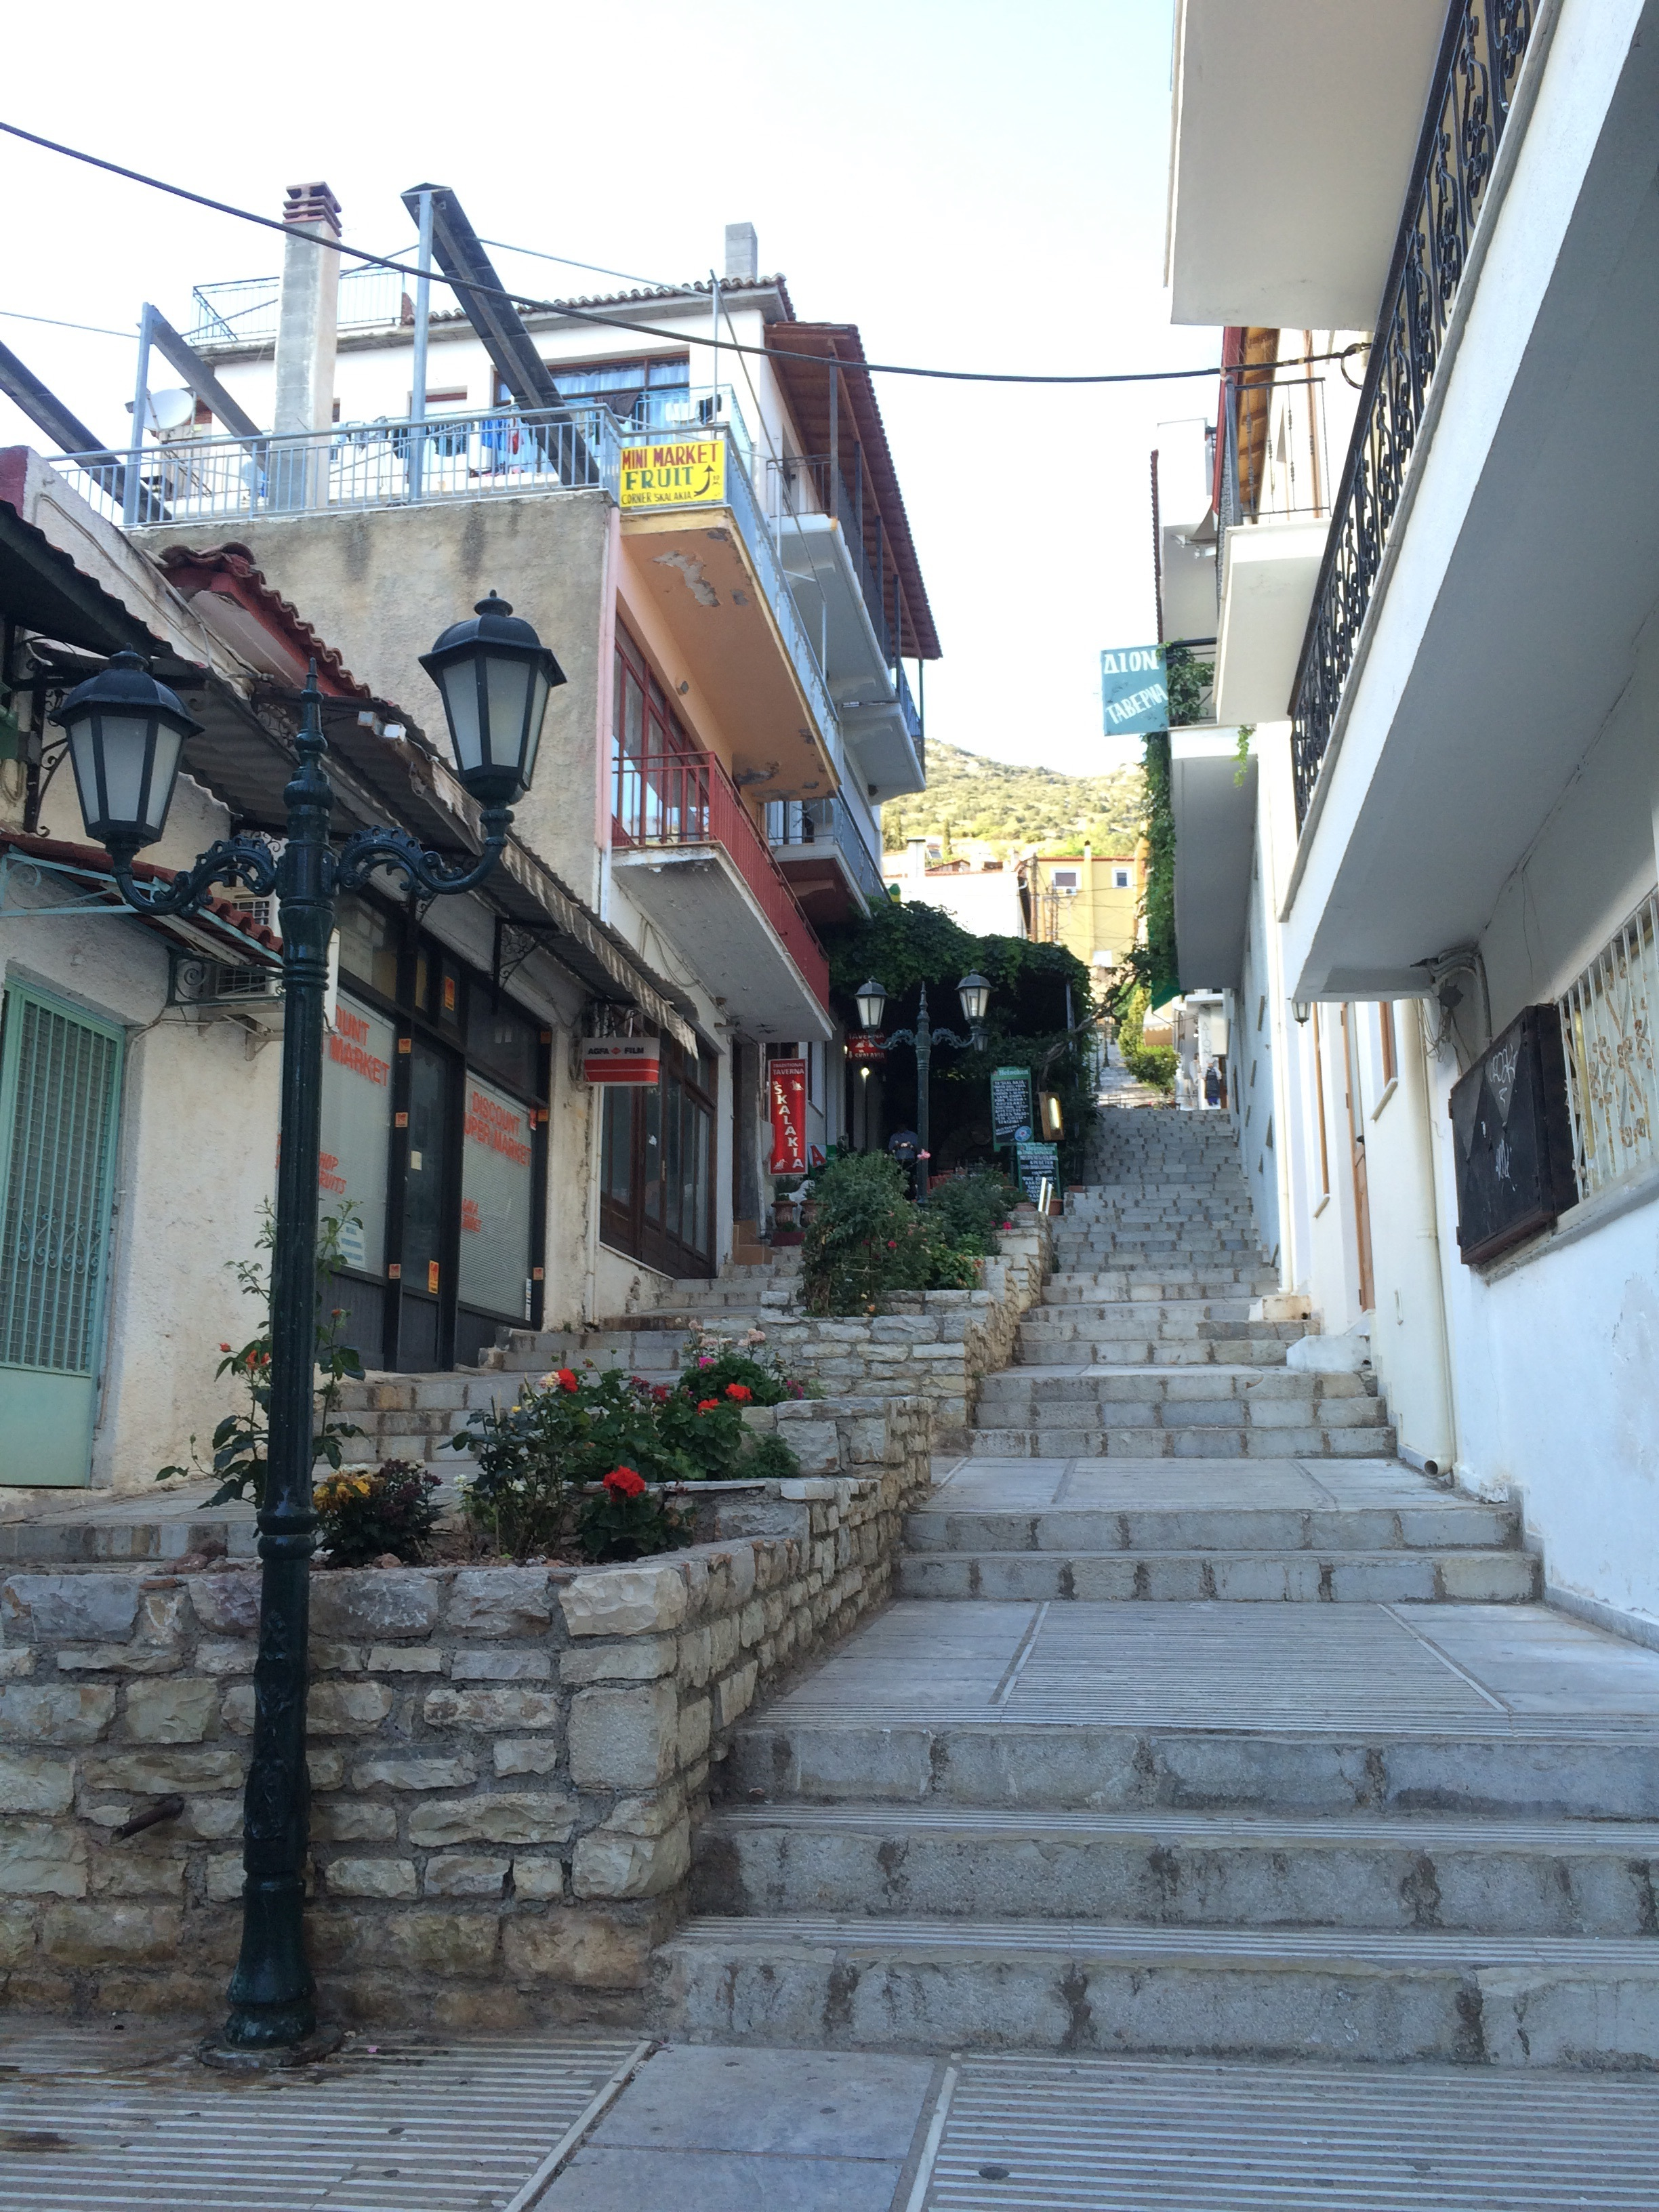 Street in Delphi